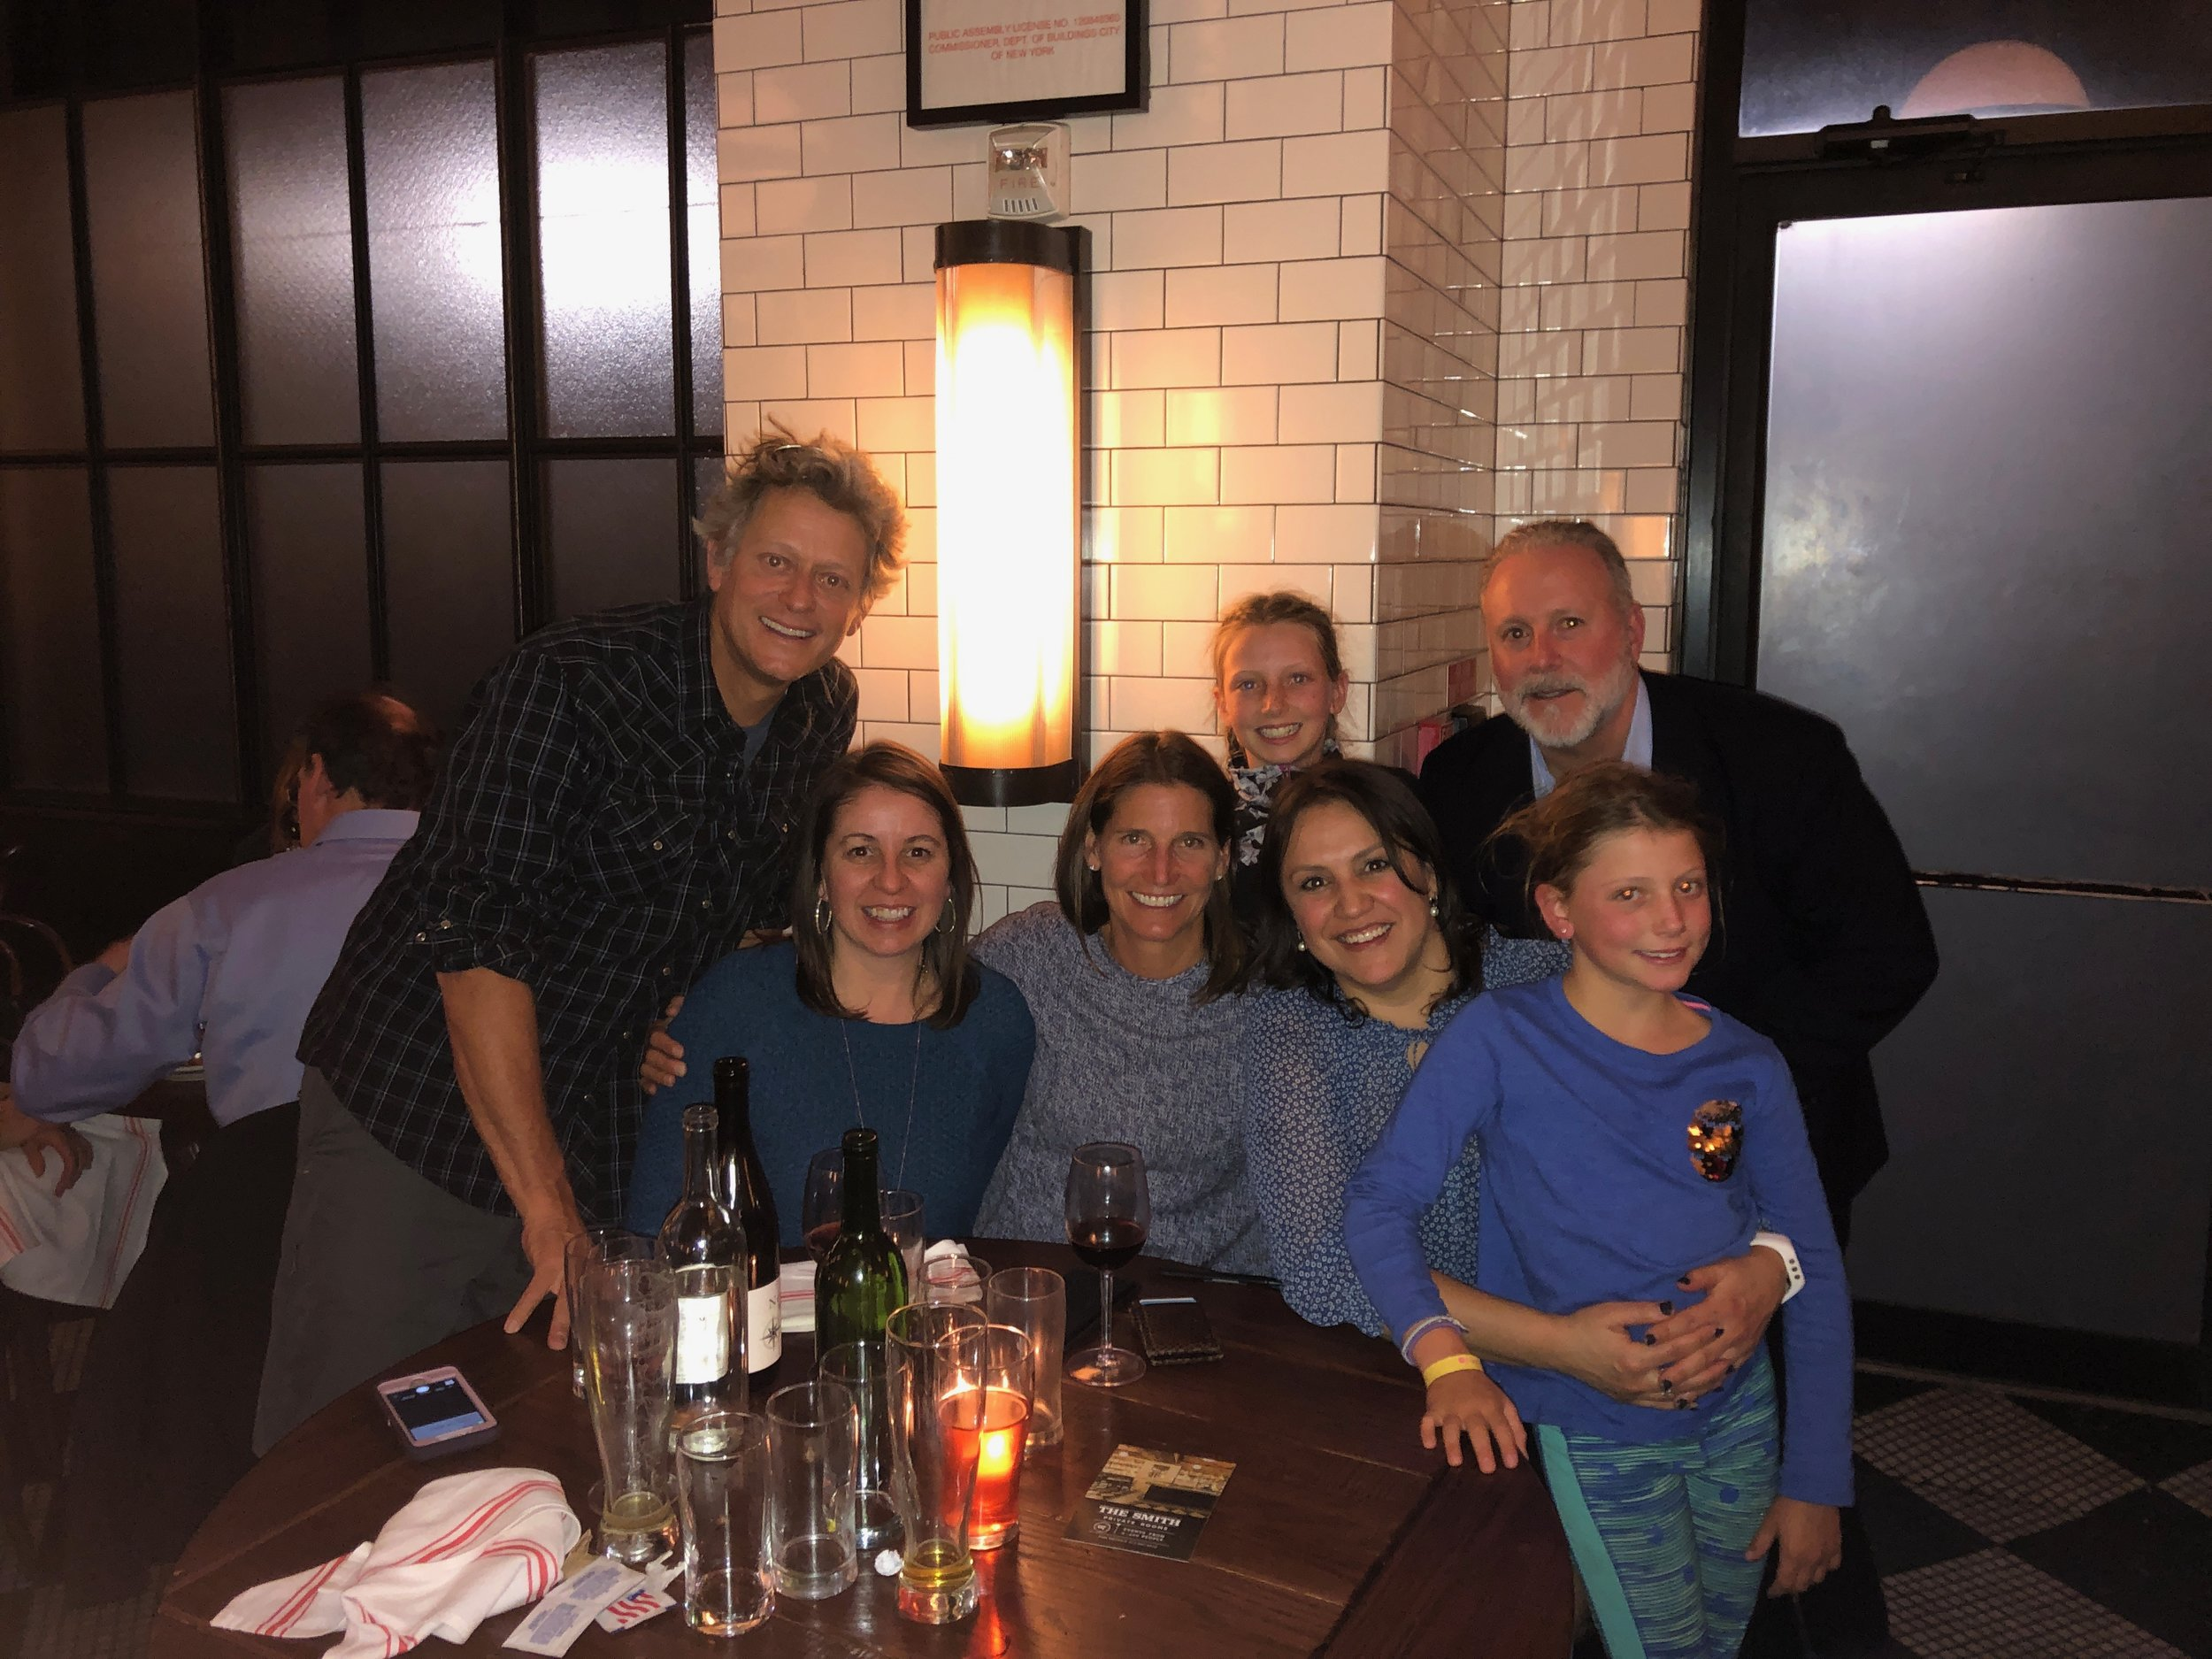 John, Liz, Me, Ellie, Rosemary, Sam, Isla